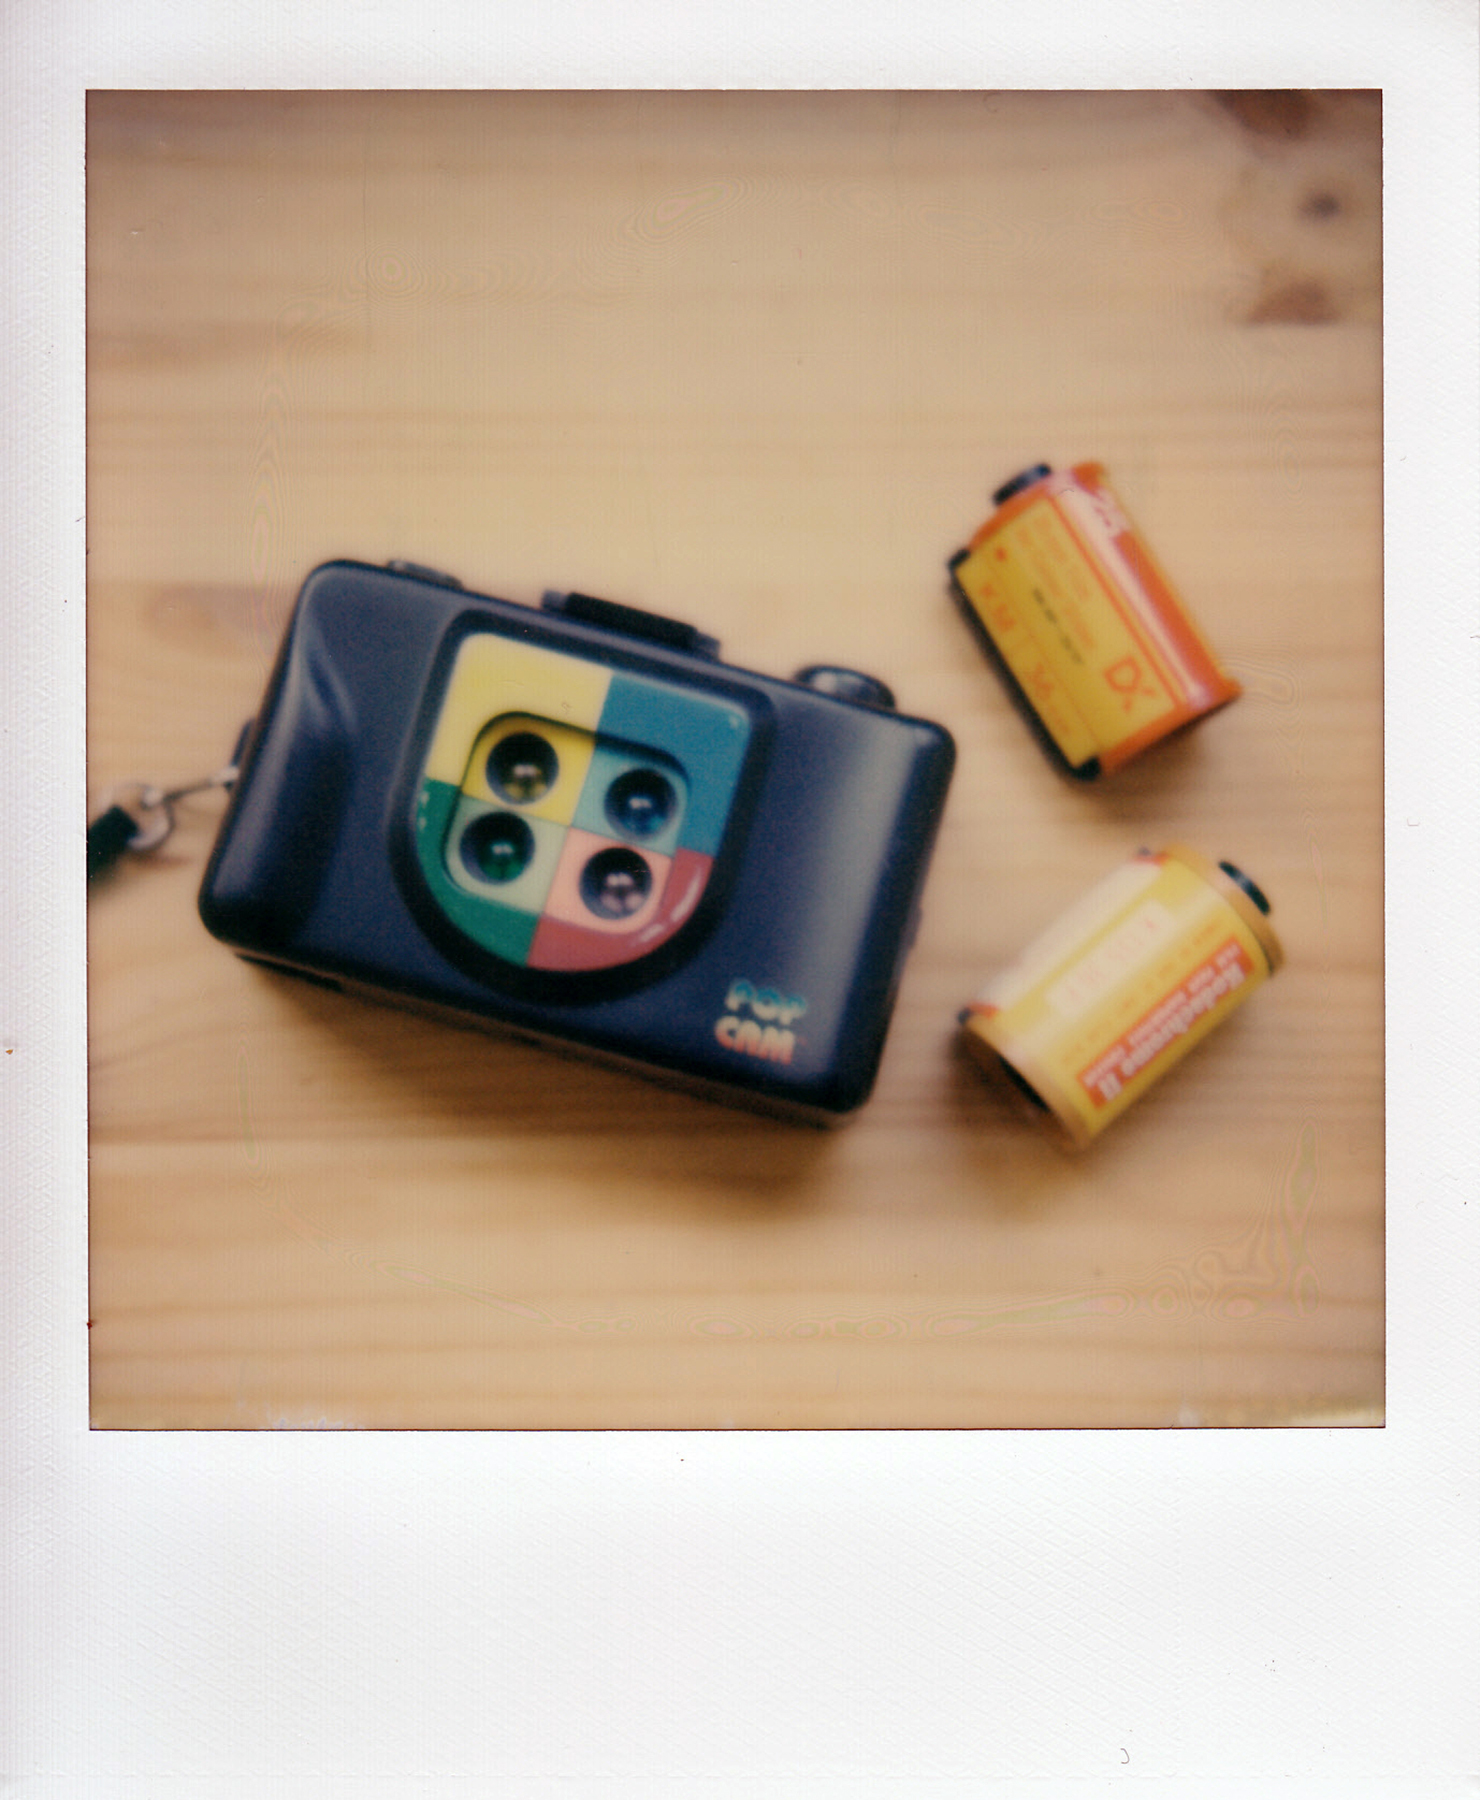 Untitled | Polaroid SX70 | Impossible Color | La Fille Renne